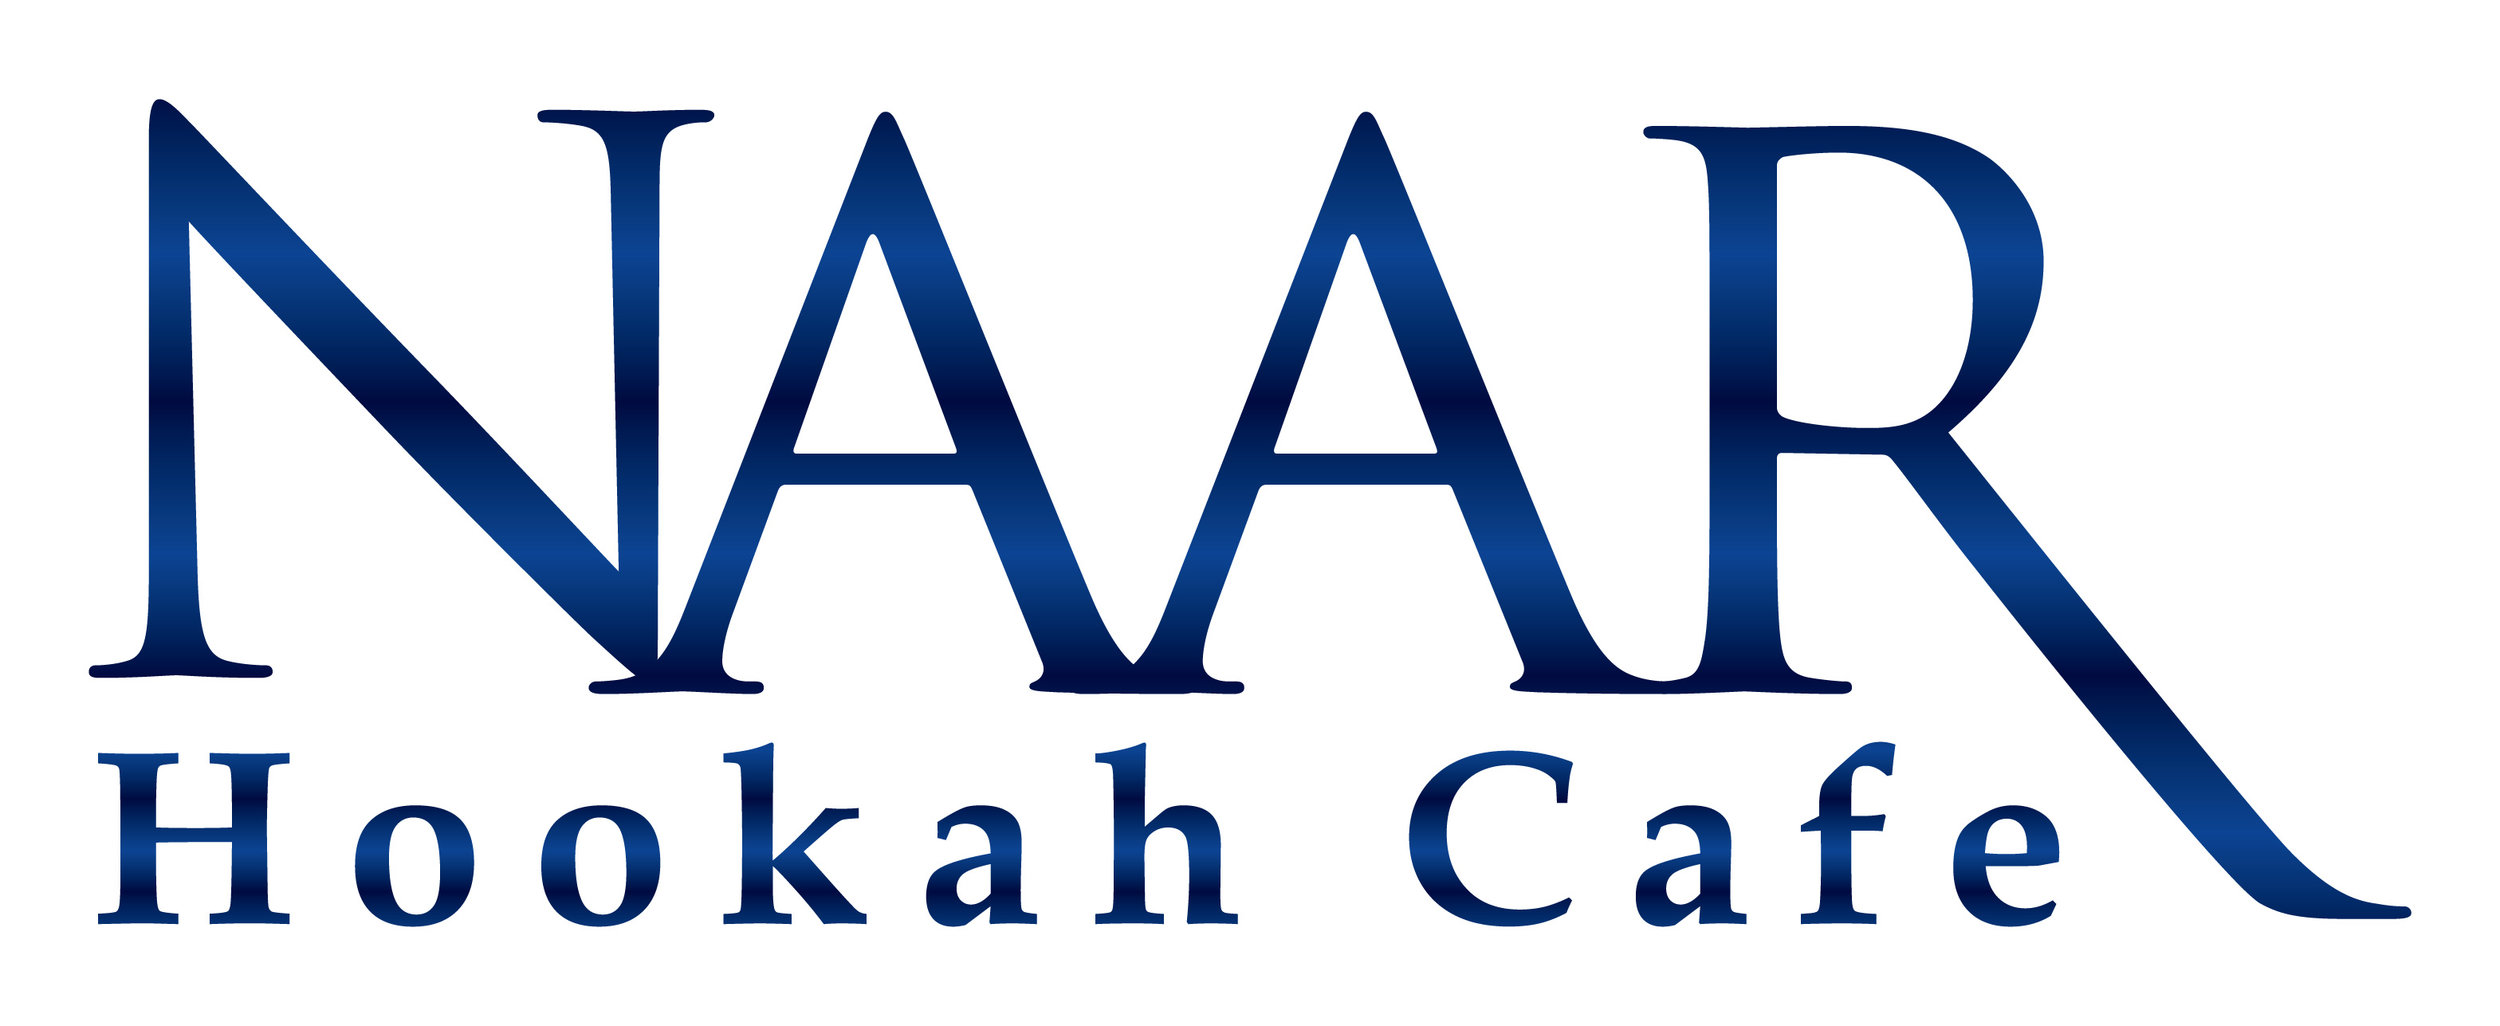 Naar Hookah Cafe - Logo